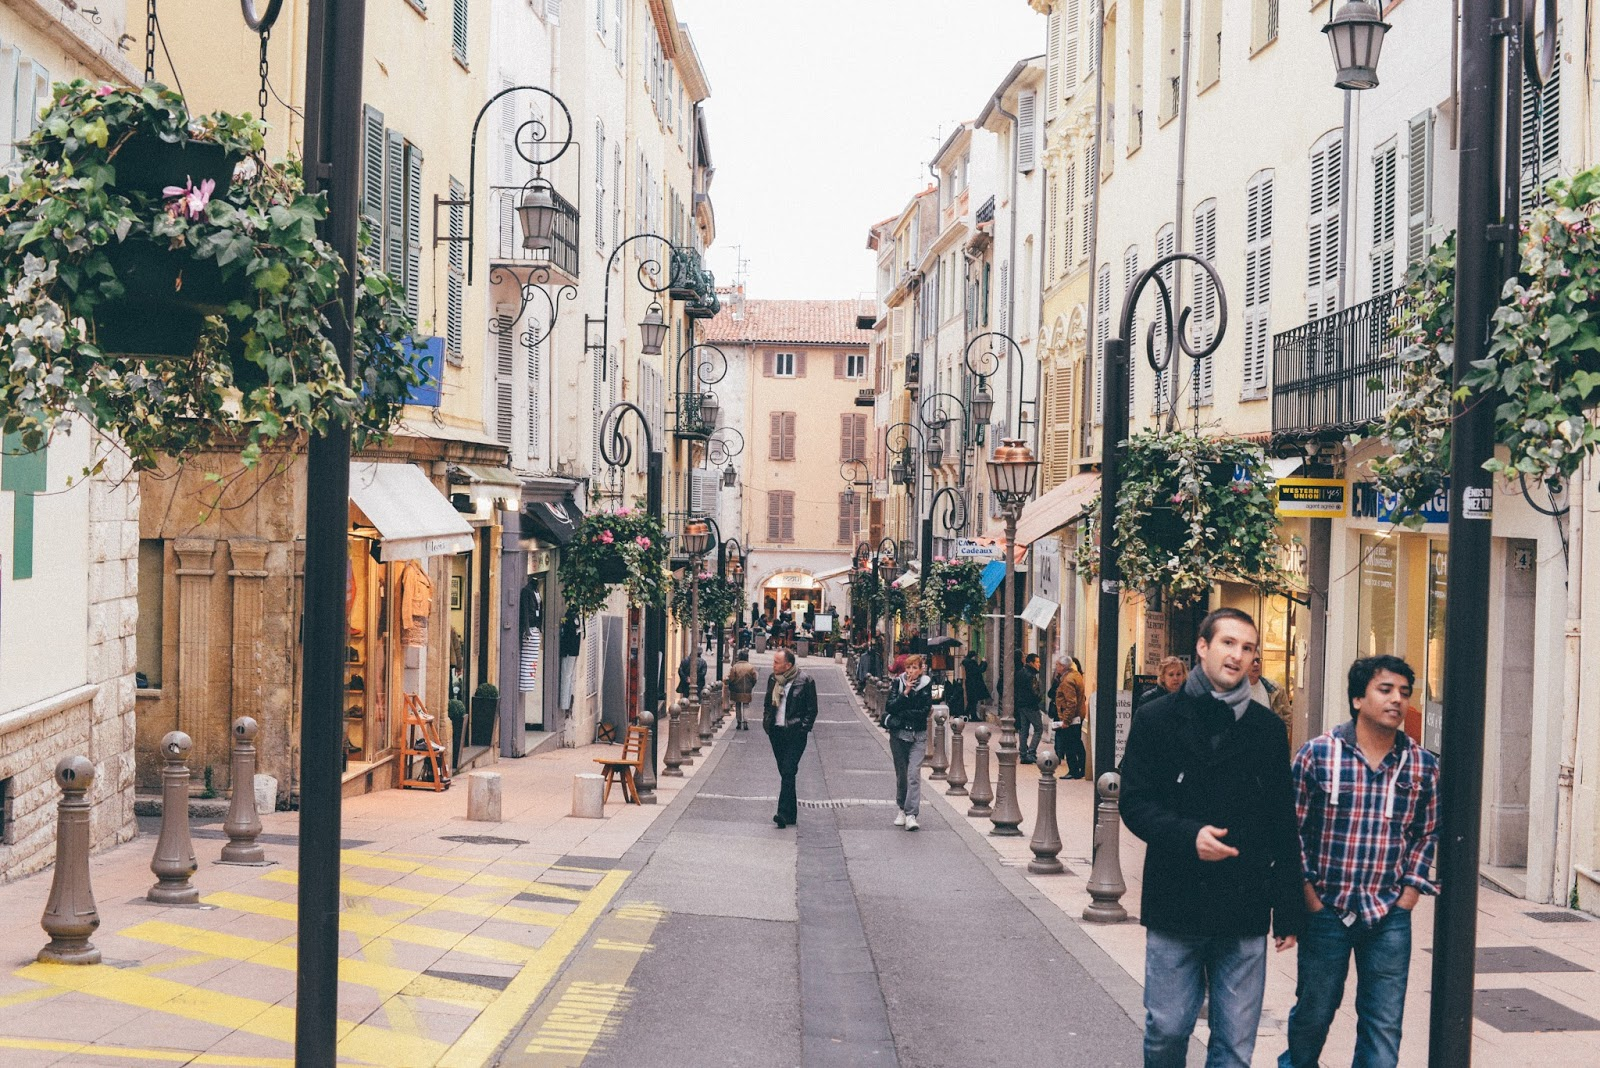 Rue Vieil Antibes